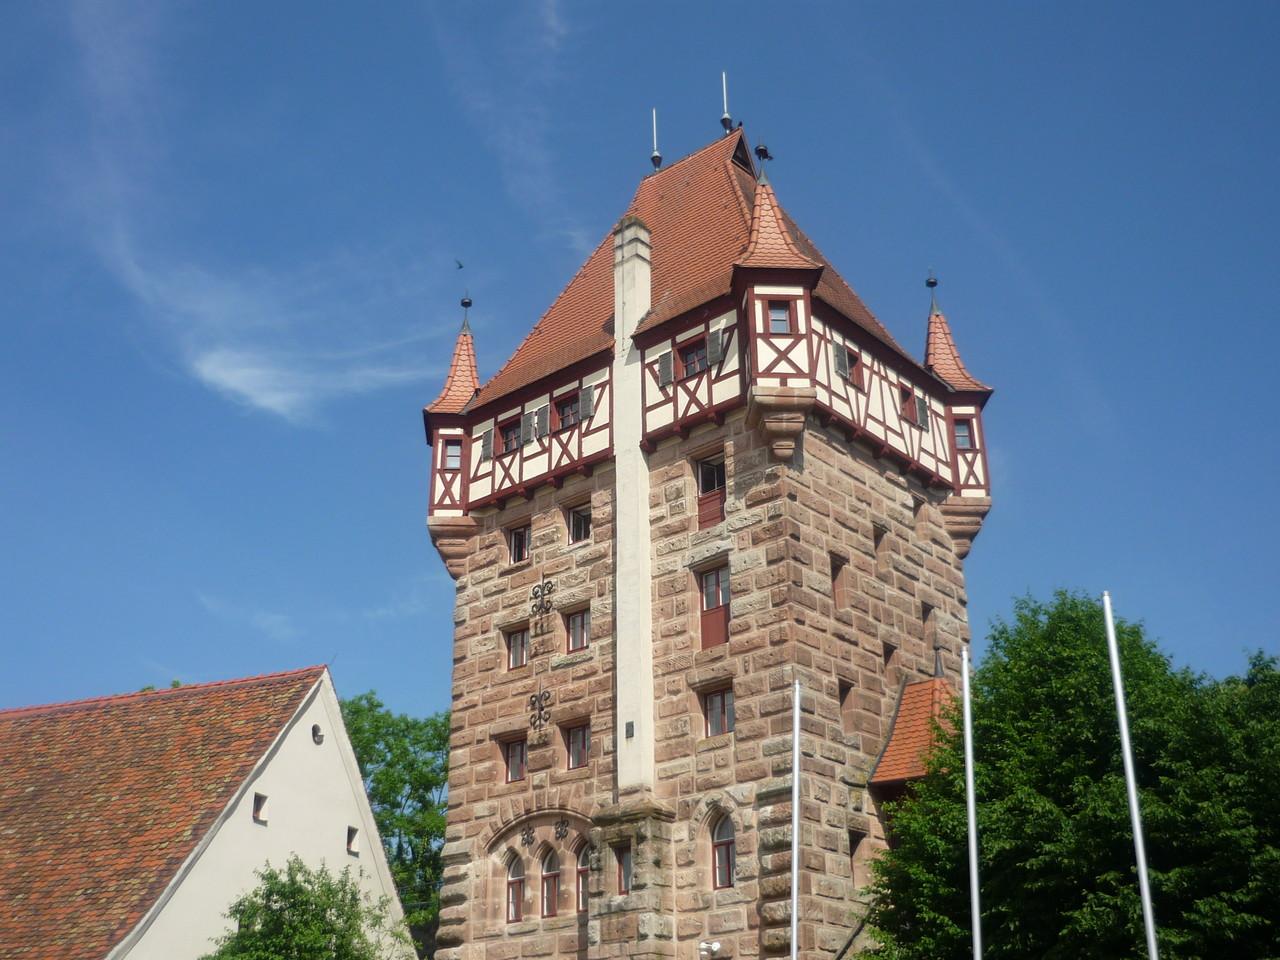 4 Башня замка Абенберг.jpg